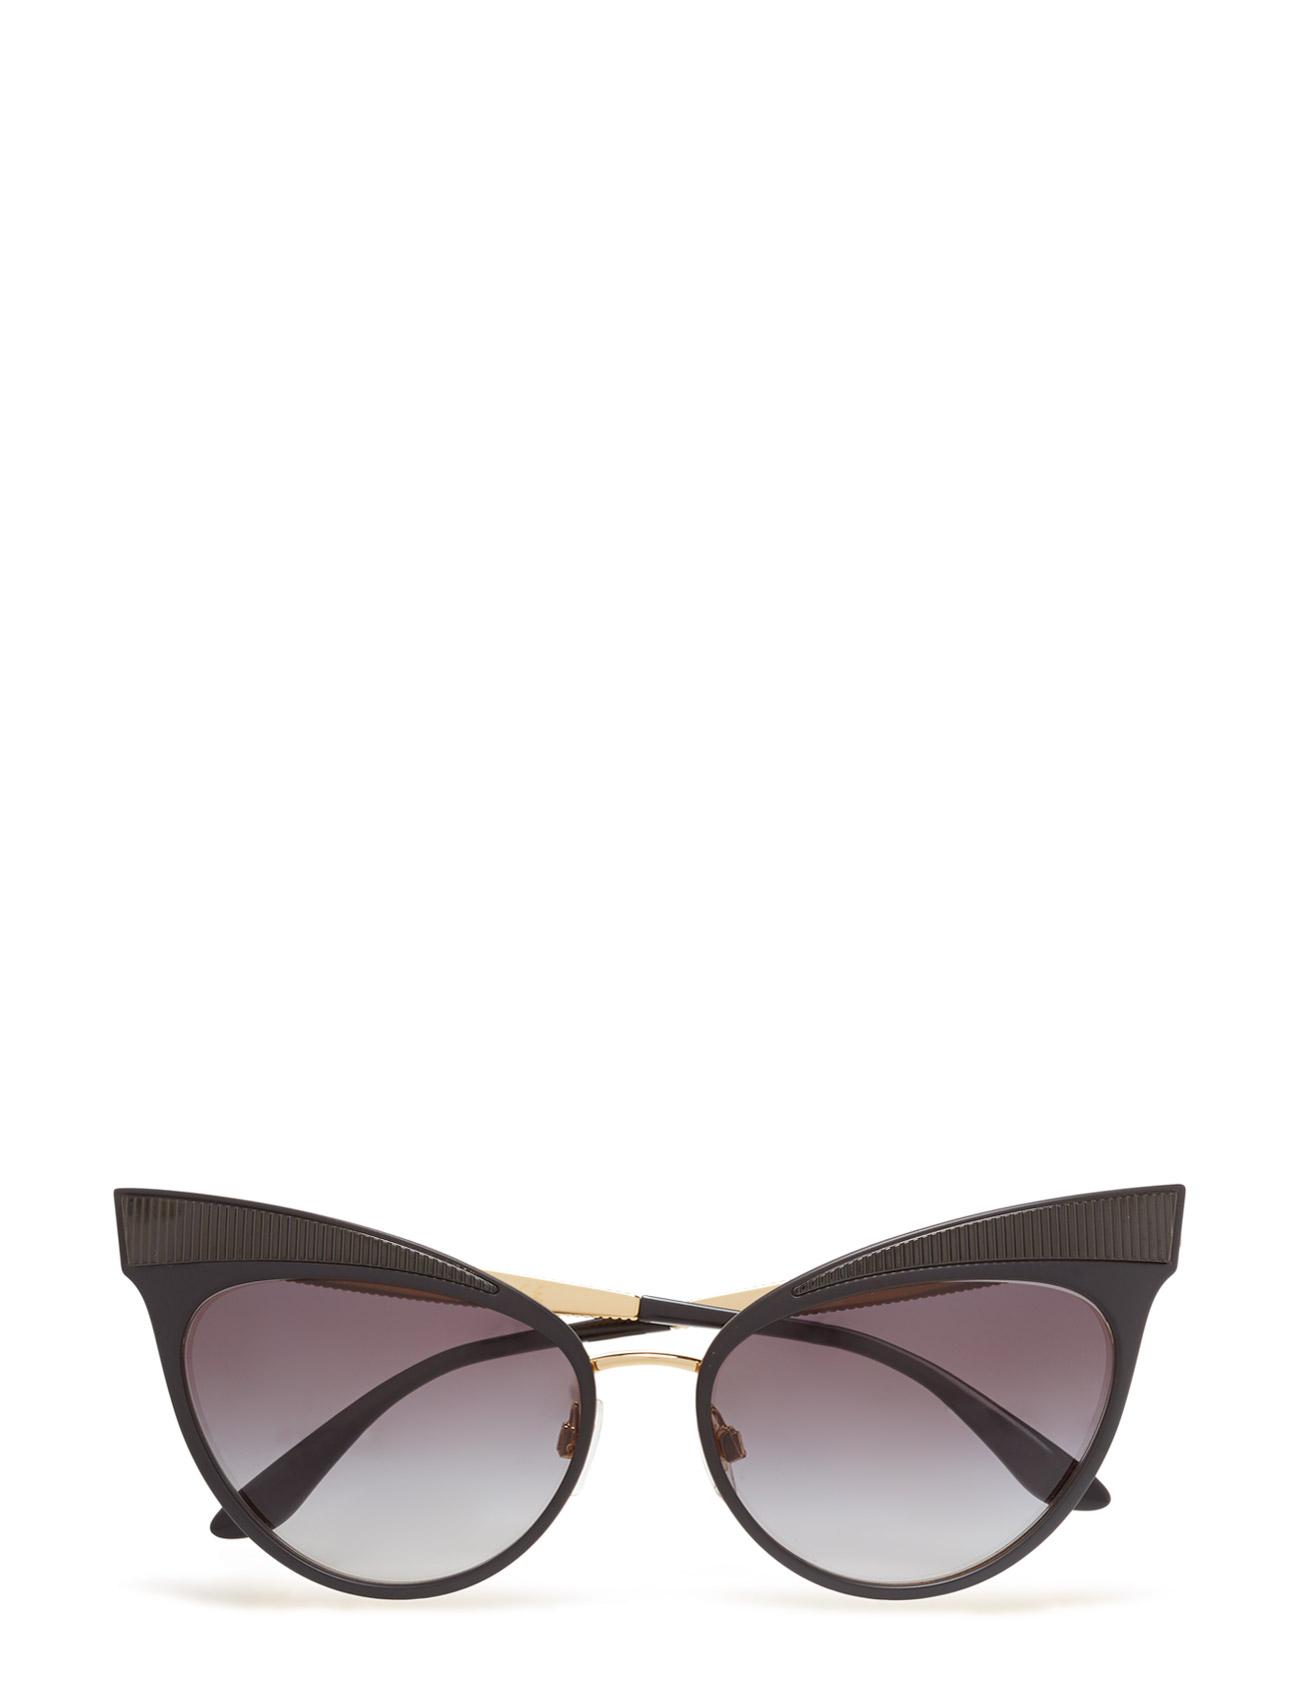 3 Layers Dolce & Gabbana Sunglasses Solbriller til Damer i